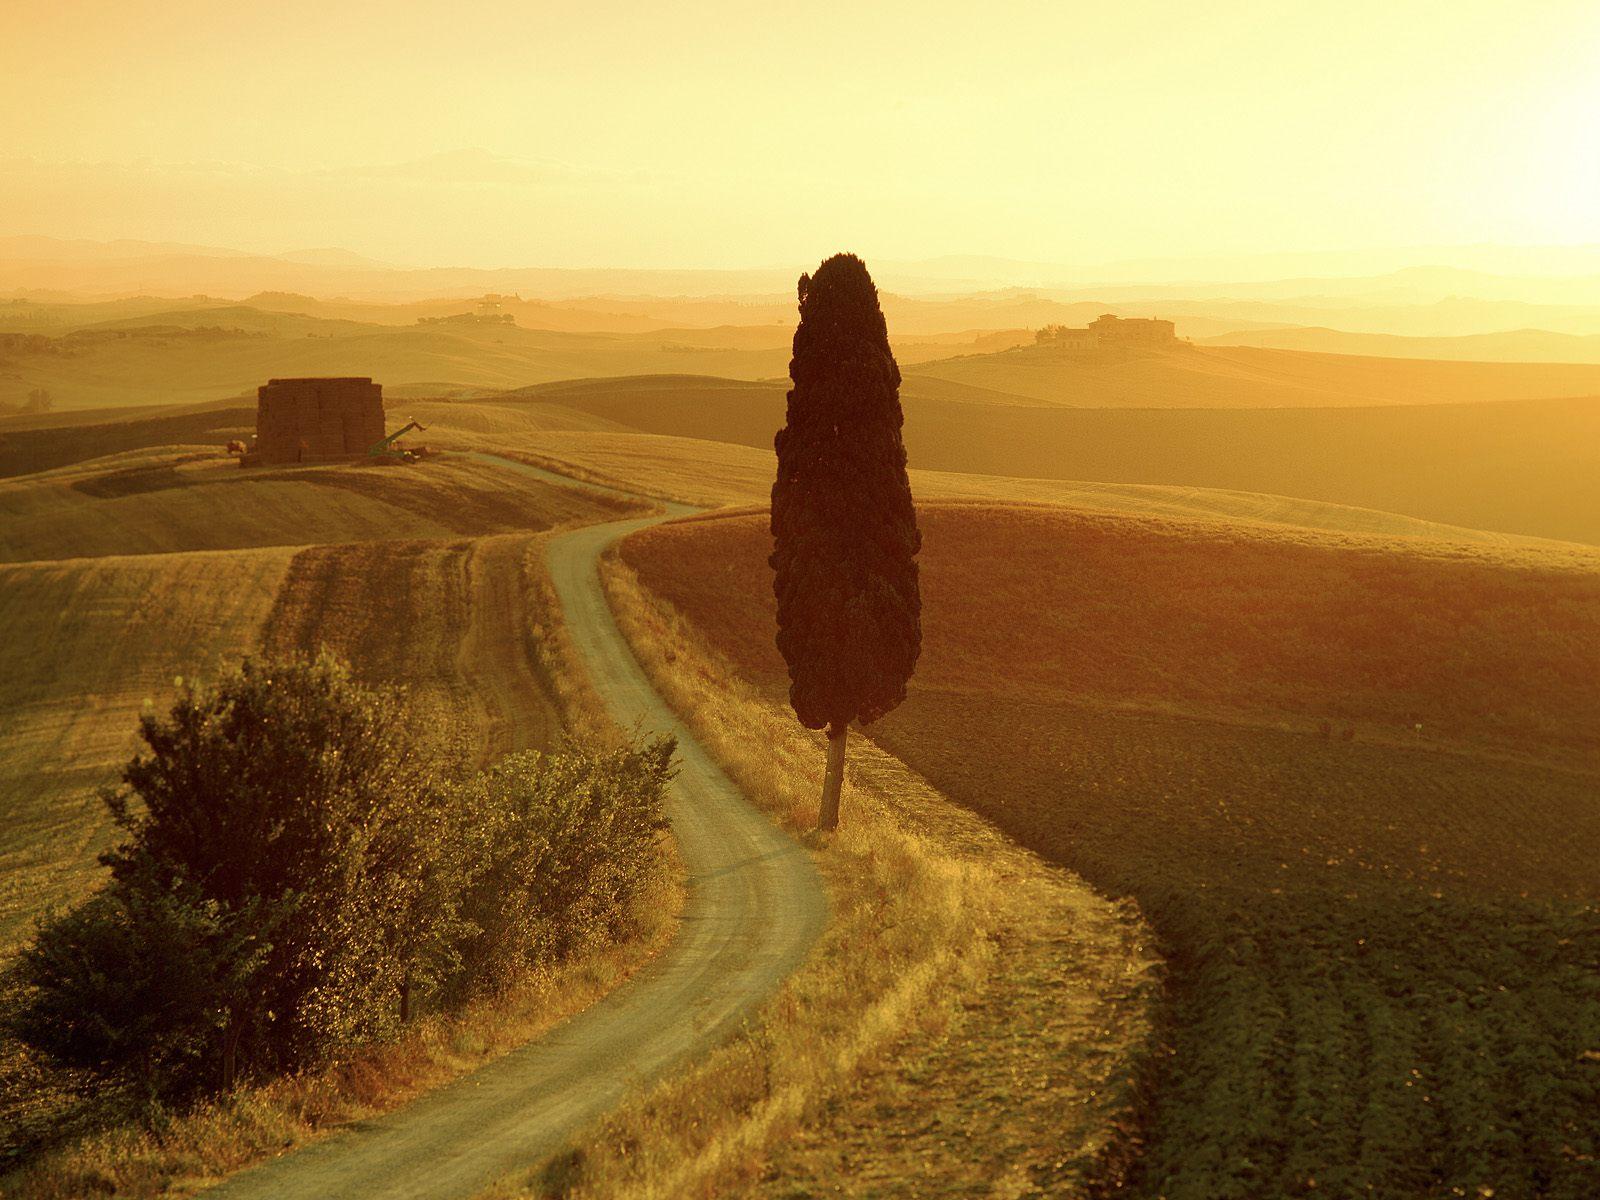 Tuscan Landscape at Sunrise, Italy